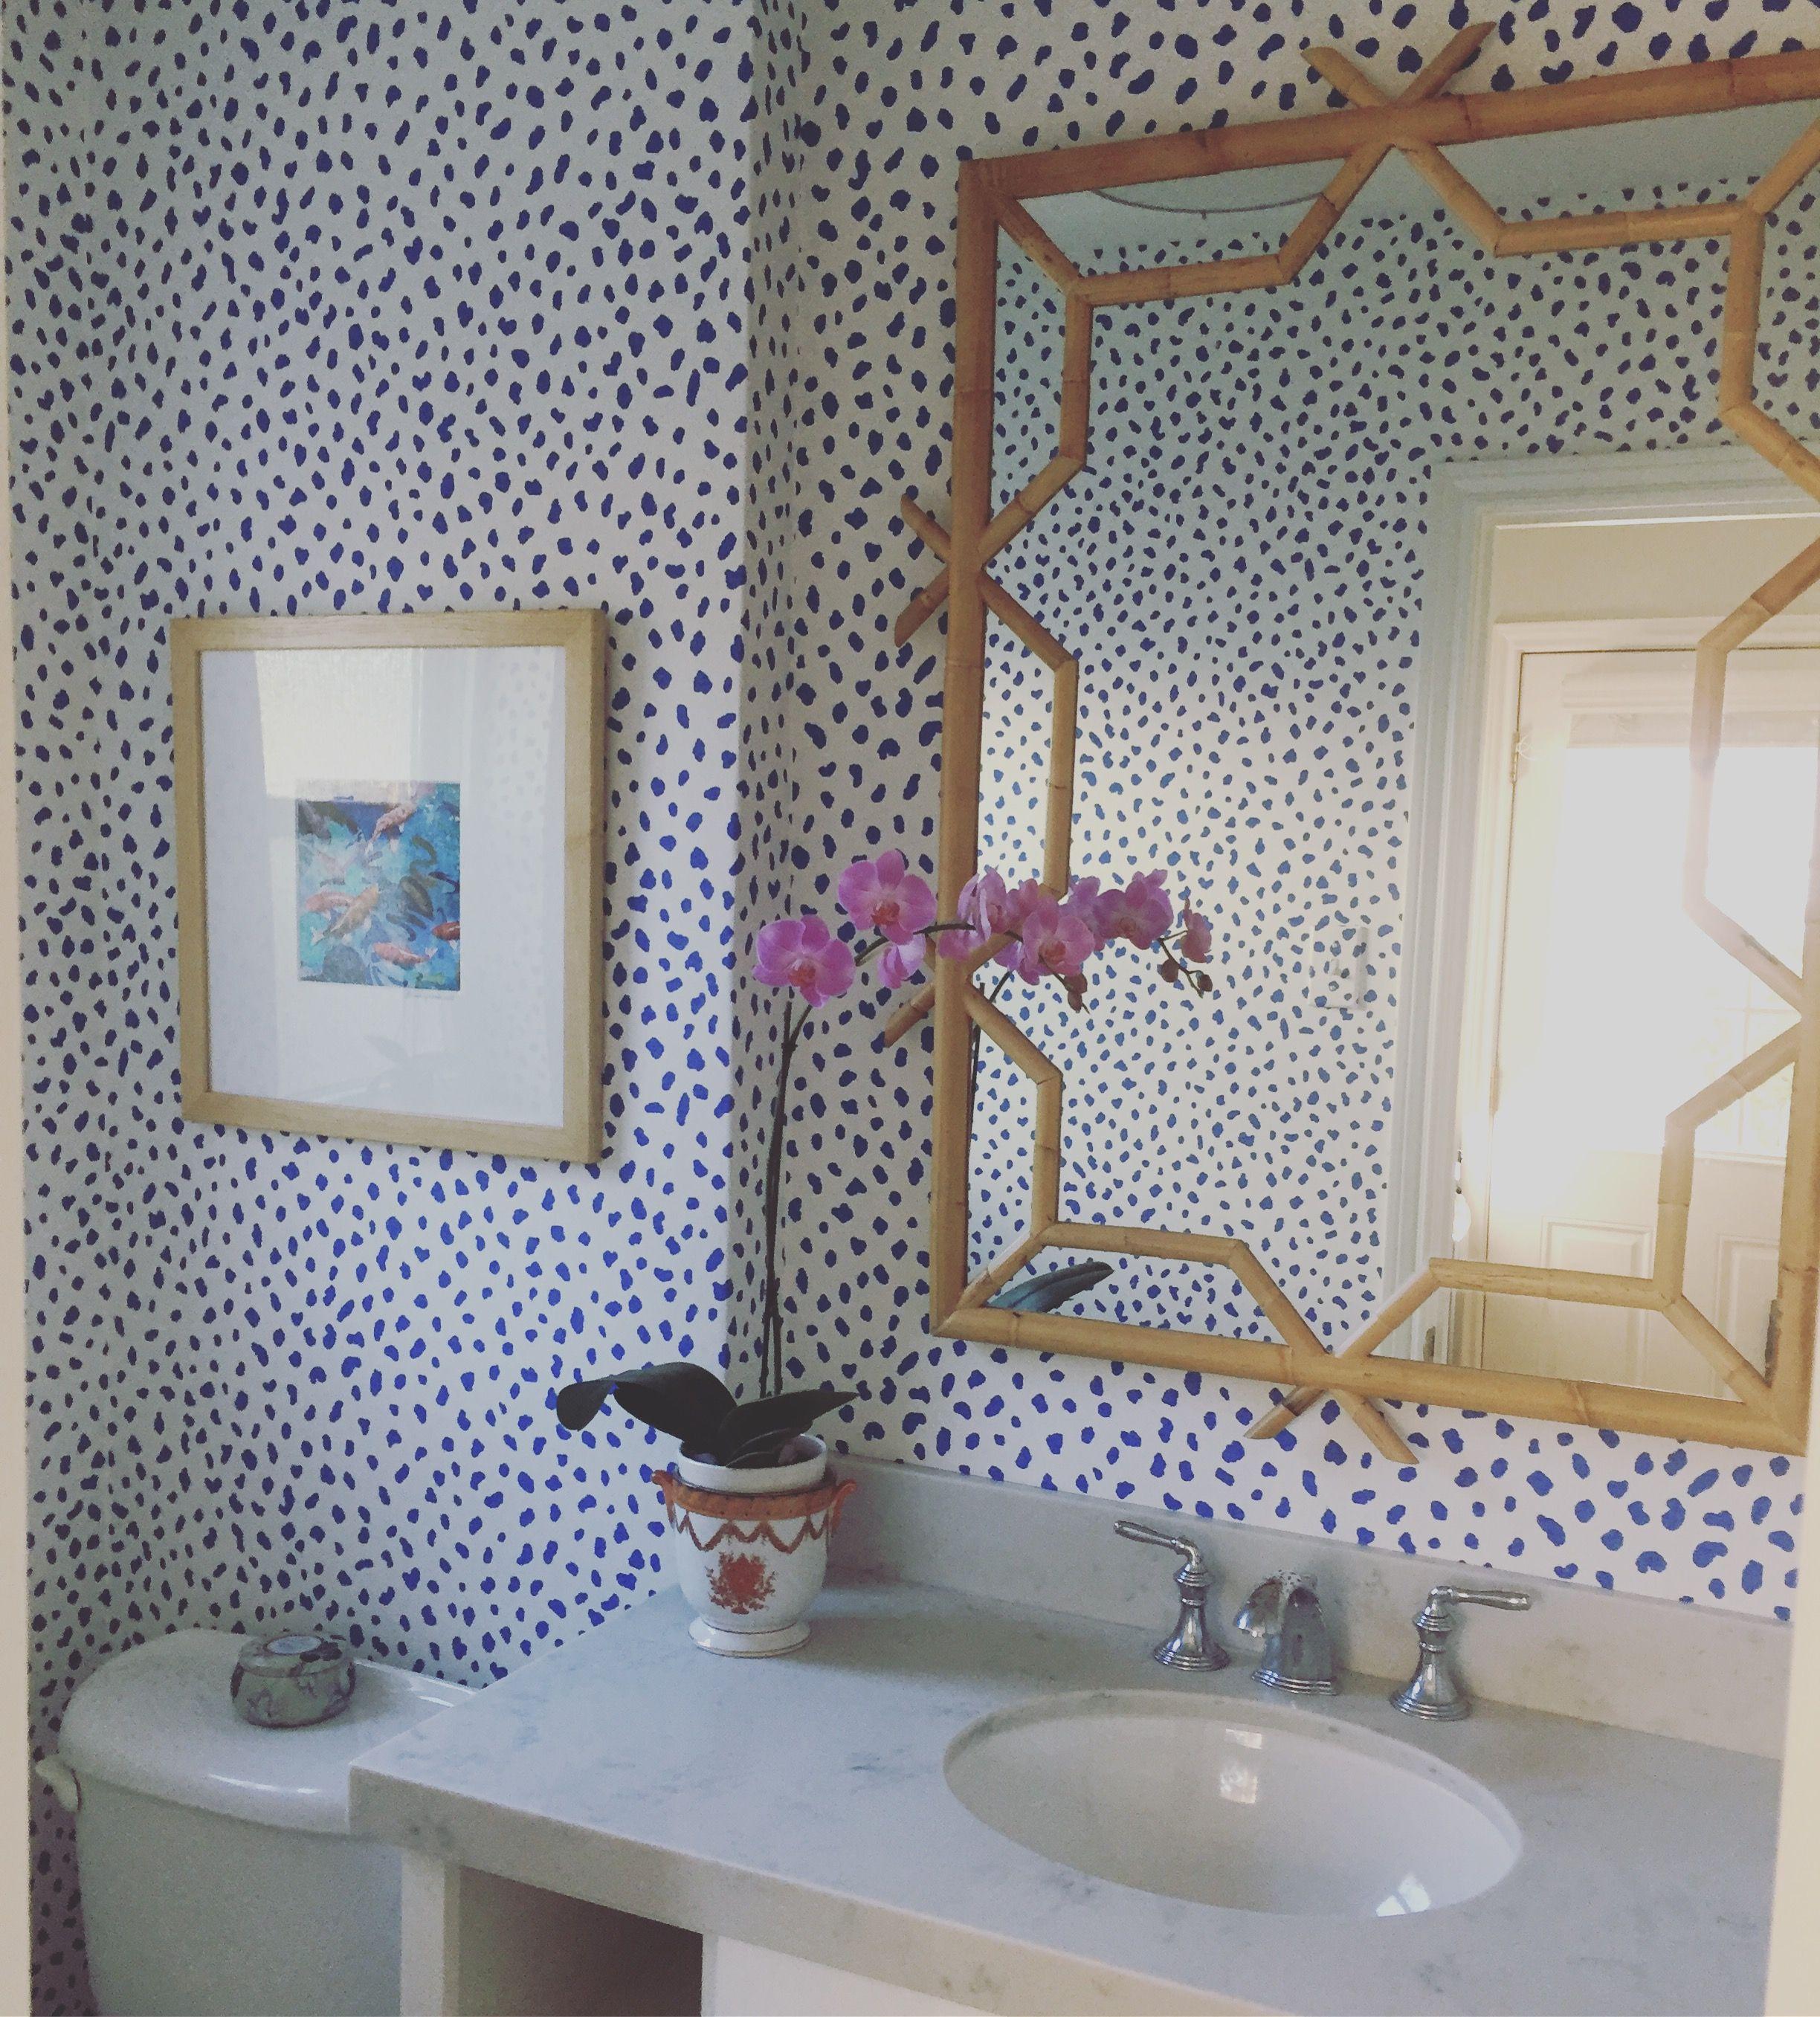 Navy Grasscloth Wallpaper And Gold Rivets Mirror: Thibaut Tanzania Wallpaper, Serena And Lily Mirror